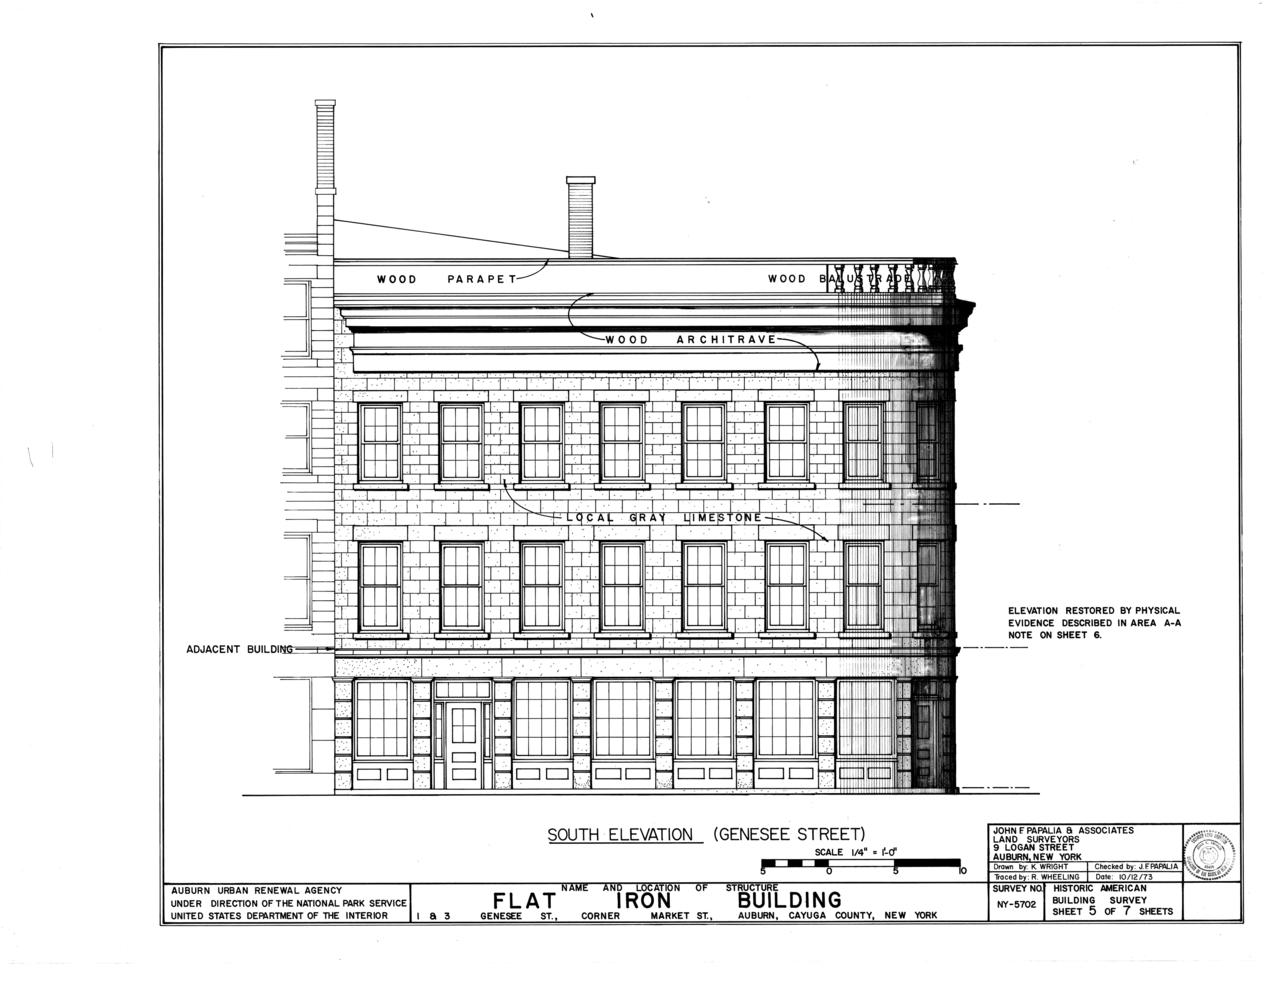 New york cayuga county - File Flat Iron Building 1 3 Genesee Street Auburn Cayuga County Ny Habs Ny 6 Aub 8 Sheet 5 Of 7 Png